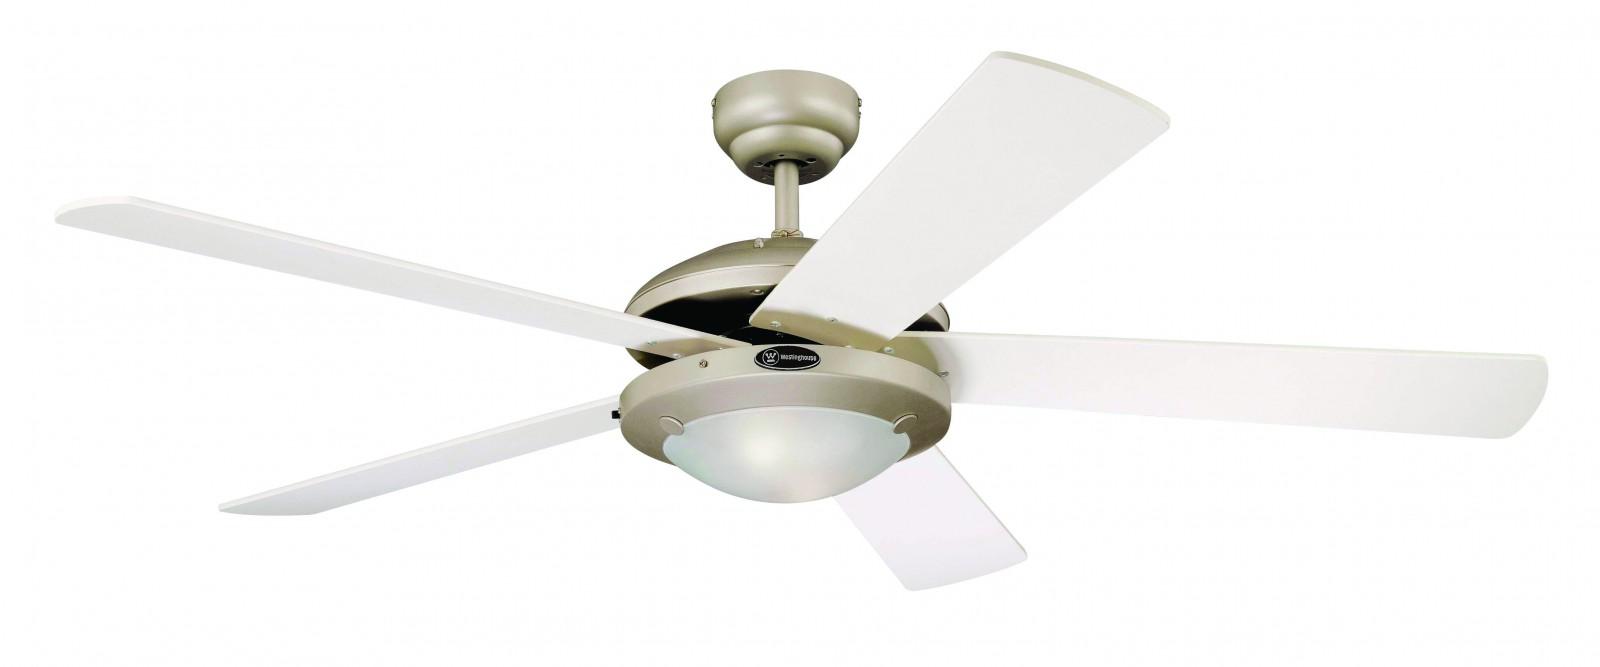 "Westinghouse ceiling fan et 132 cm 52"" with lighting"